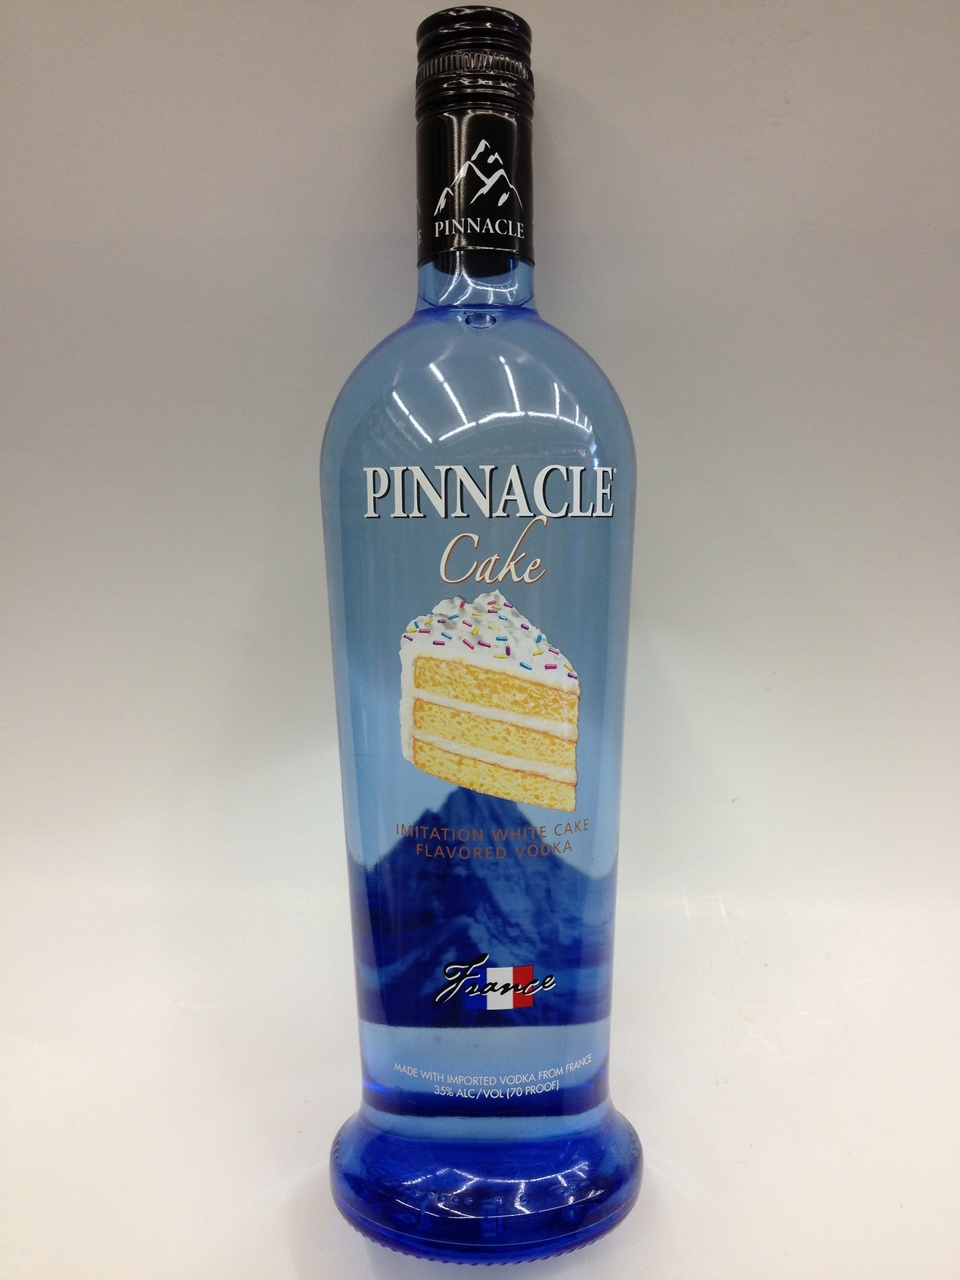 Pinnacle Cake Flavor Vodka Quality Liquor Store